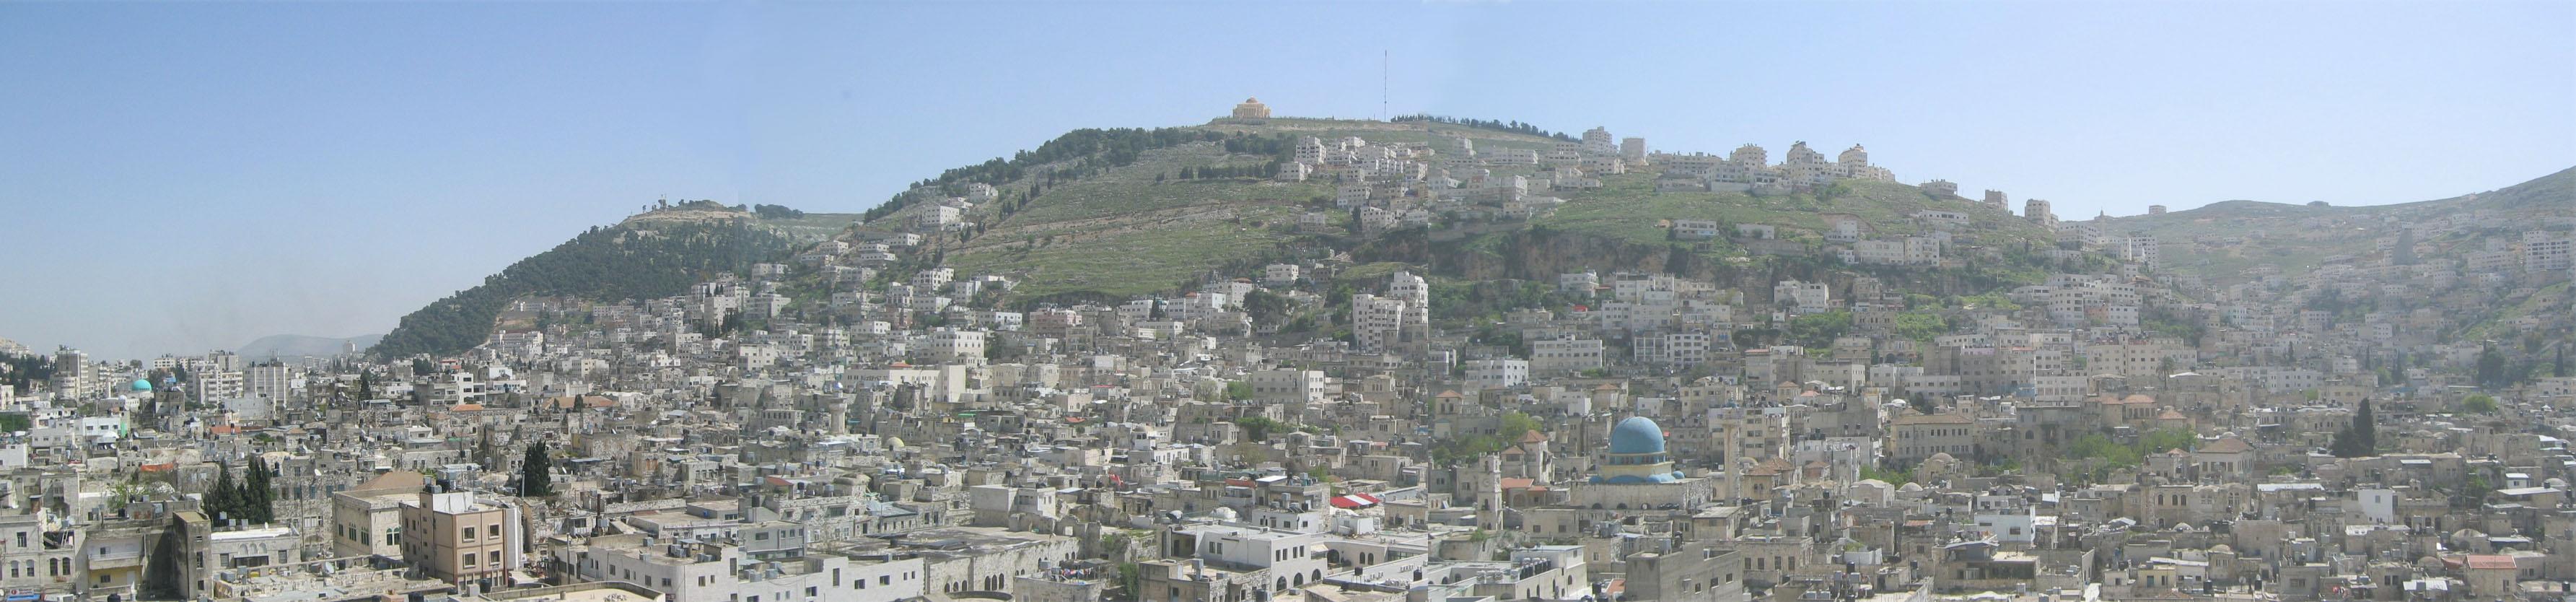 Ahmed Baraka Personal Site: Palestine (Nablus)